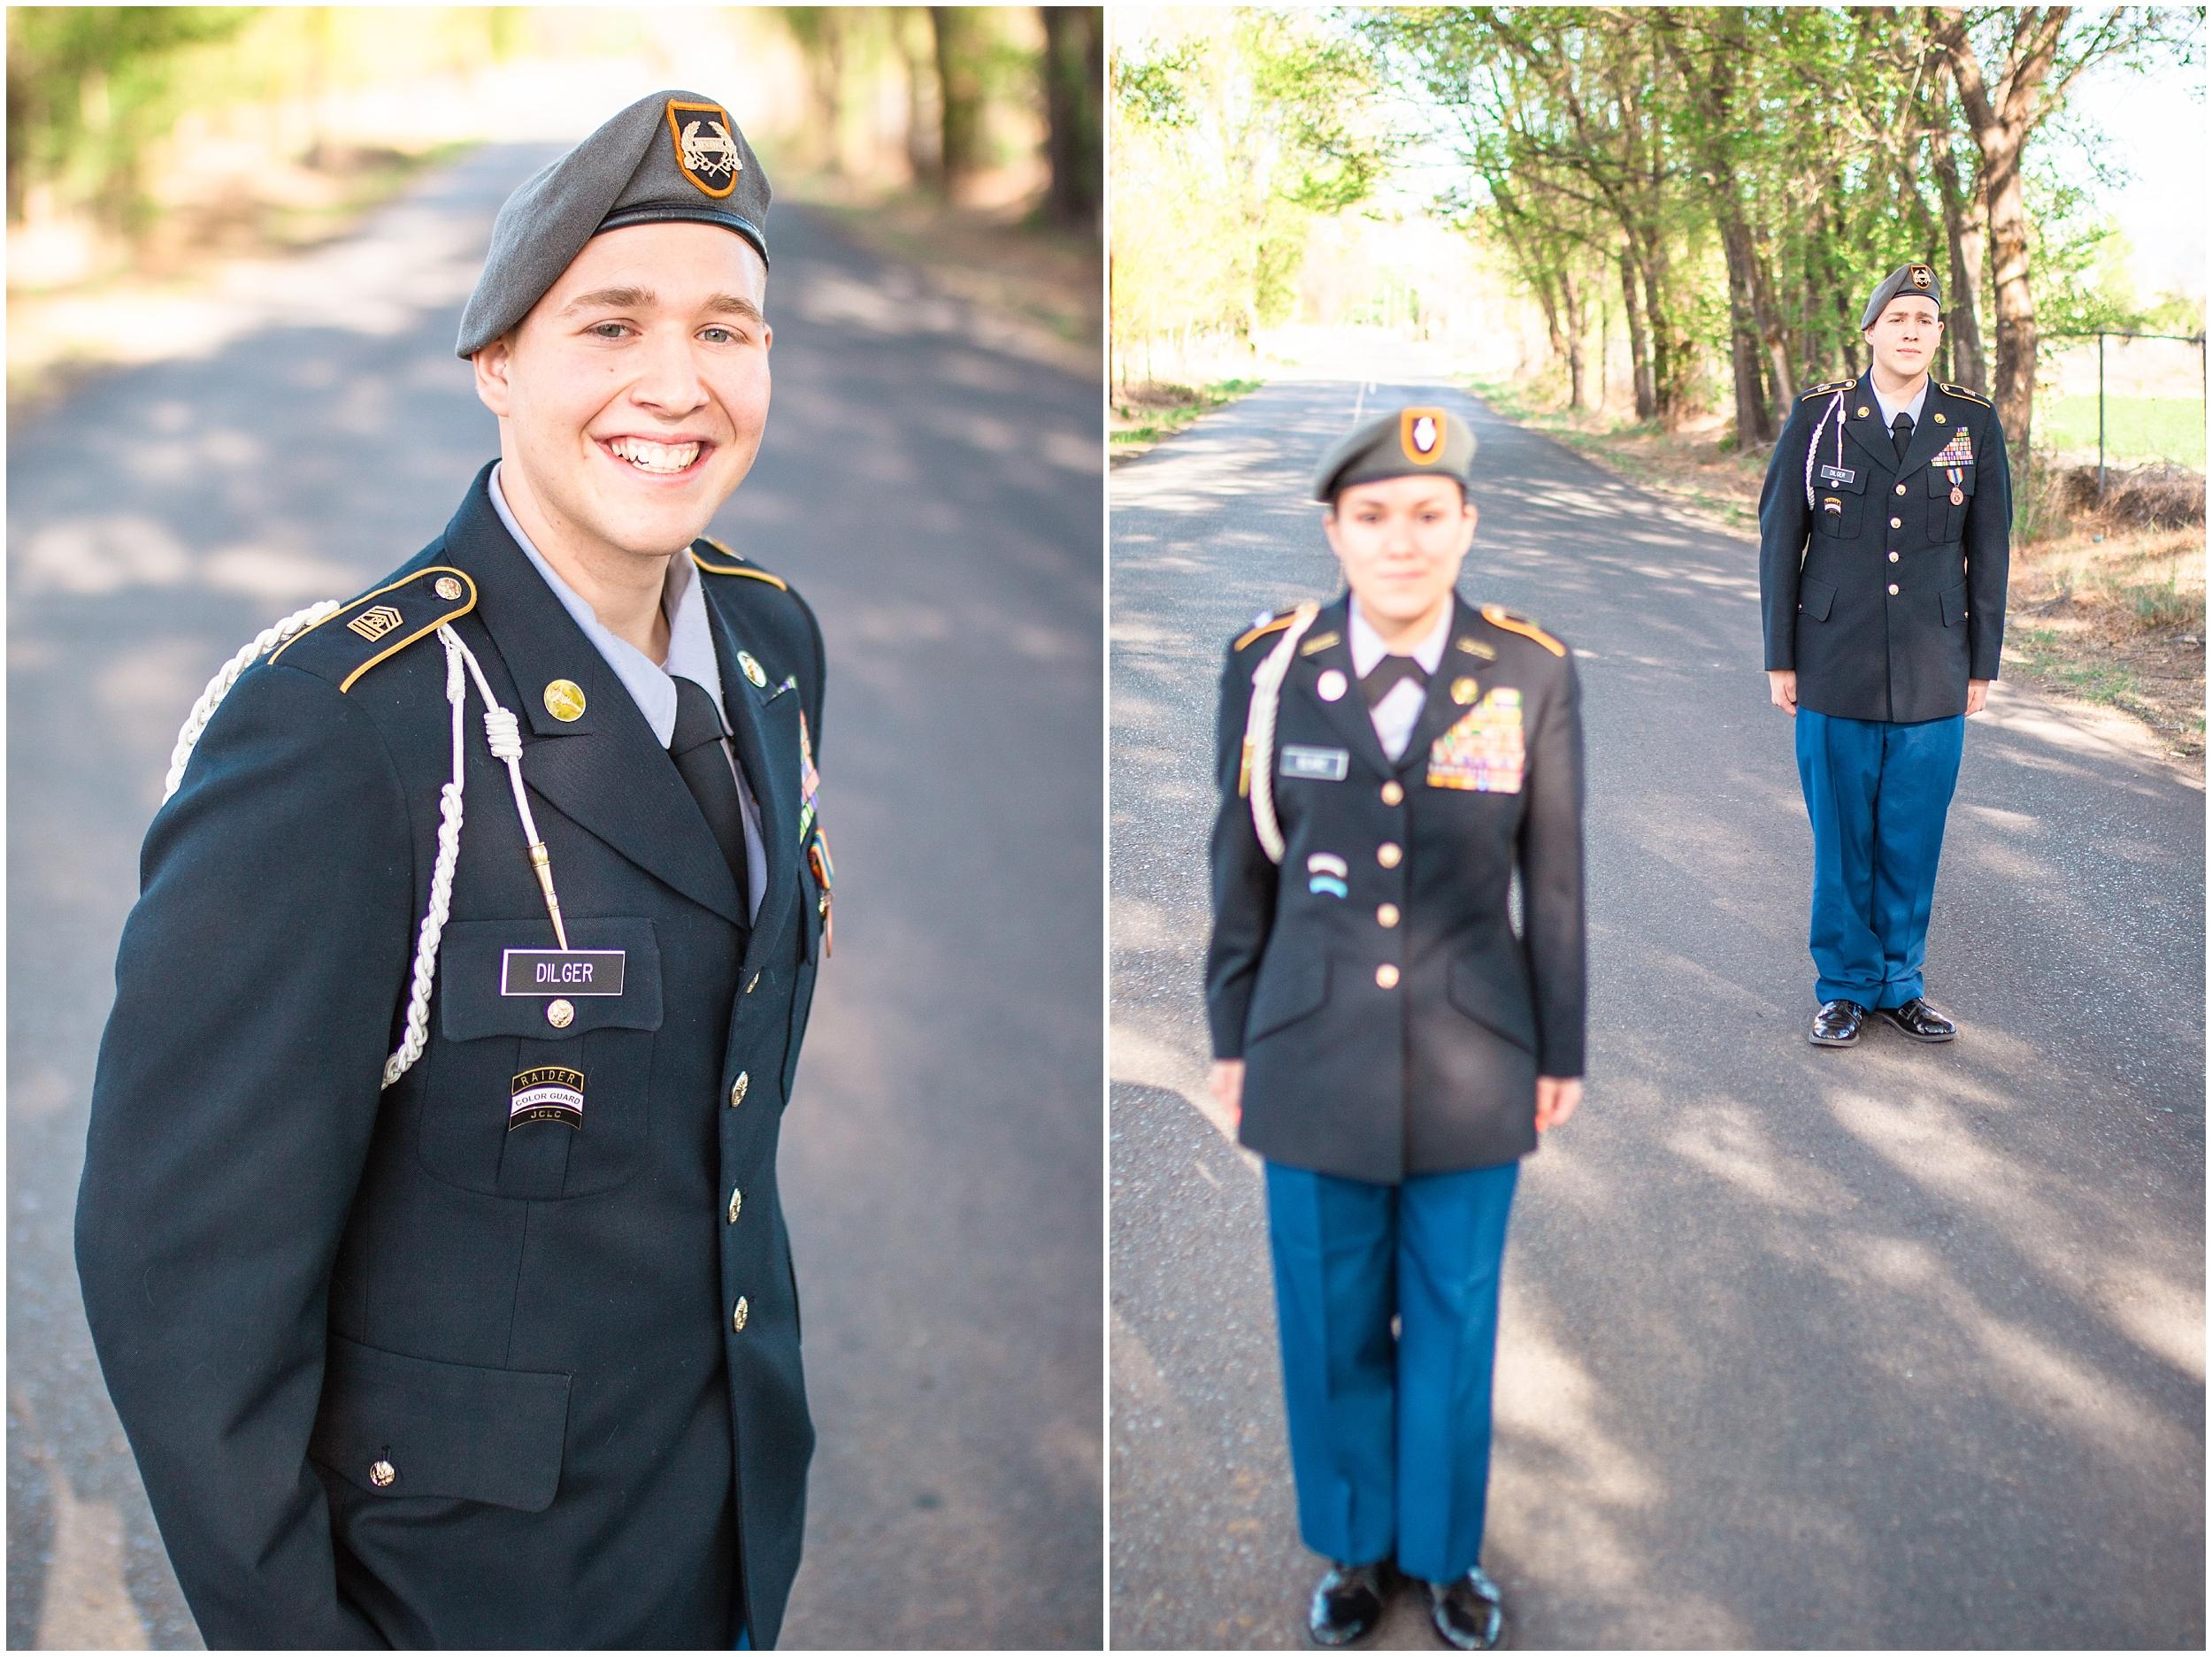 Valencia high school seniors, ROTC uniform, Tree road, 2018 Seniors